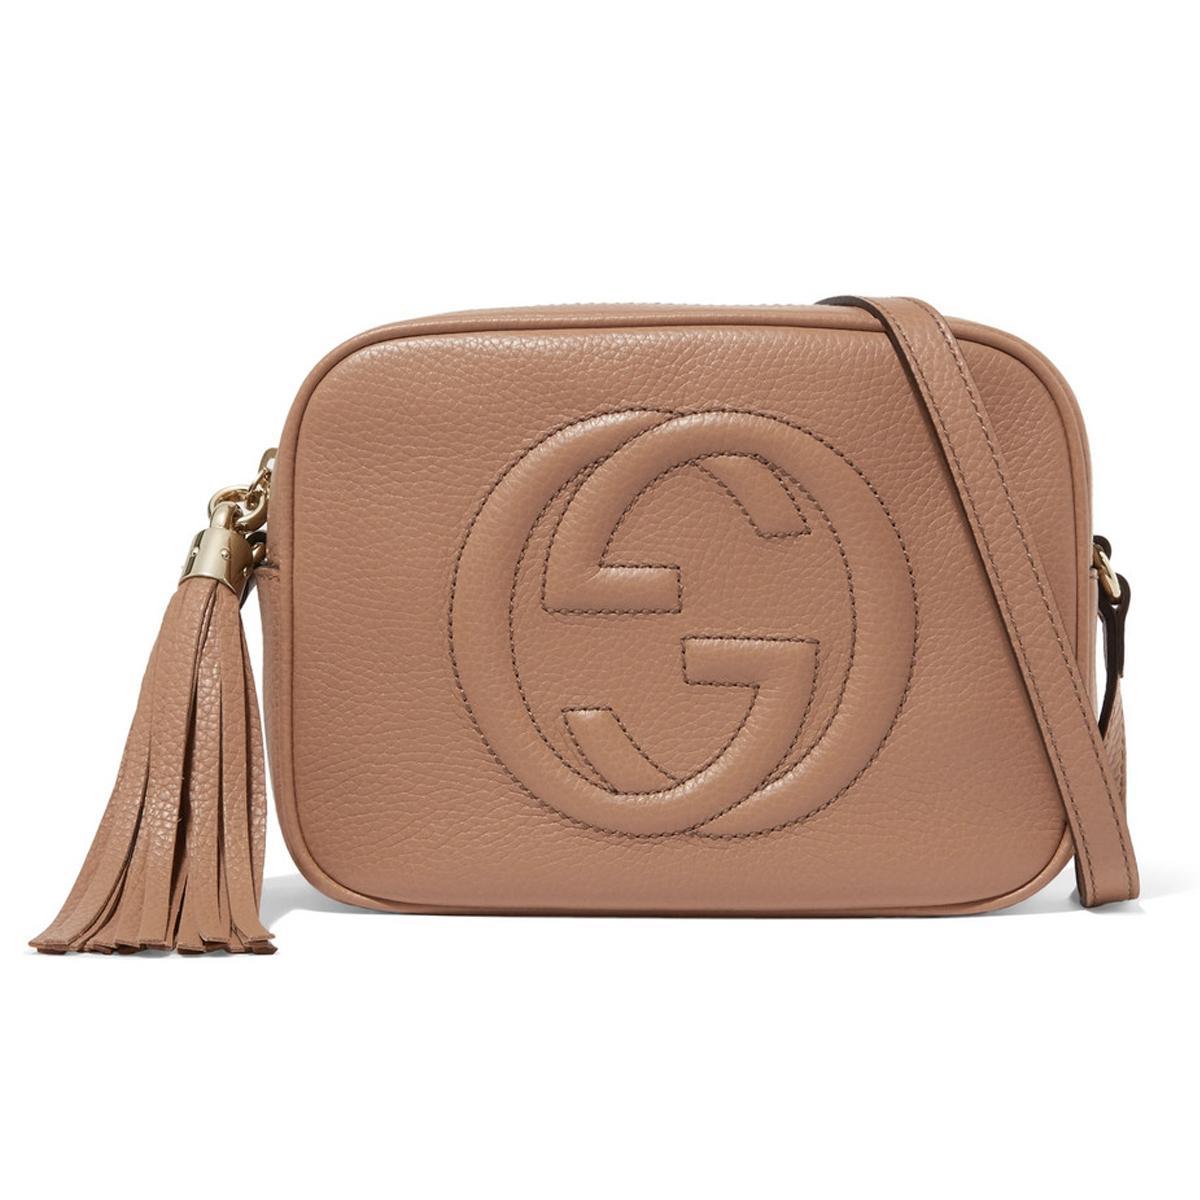 classic-designer-handbag-brands-271996-1541601309452-product.1200x0c.jpg (1200×1200)